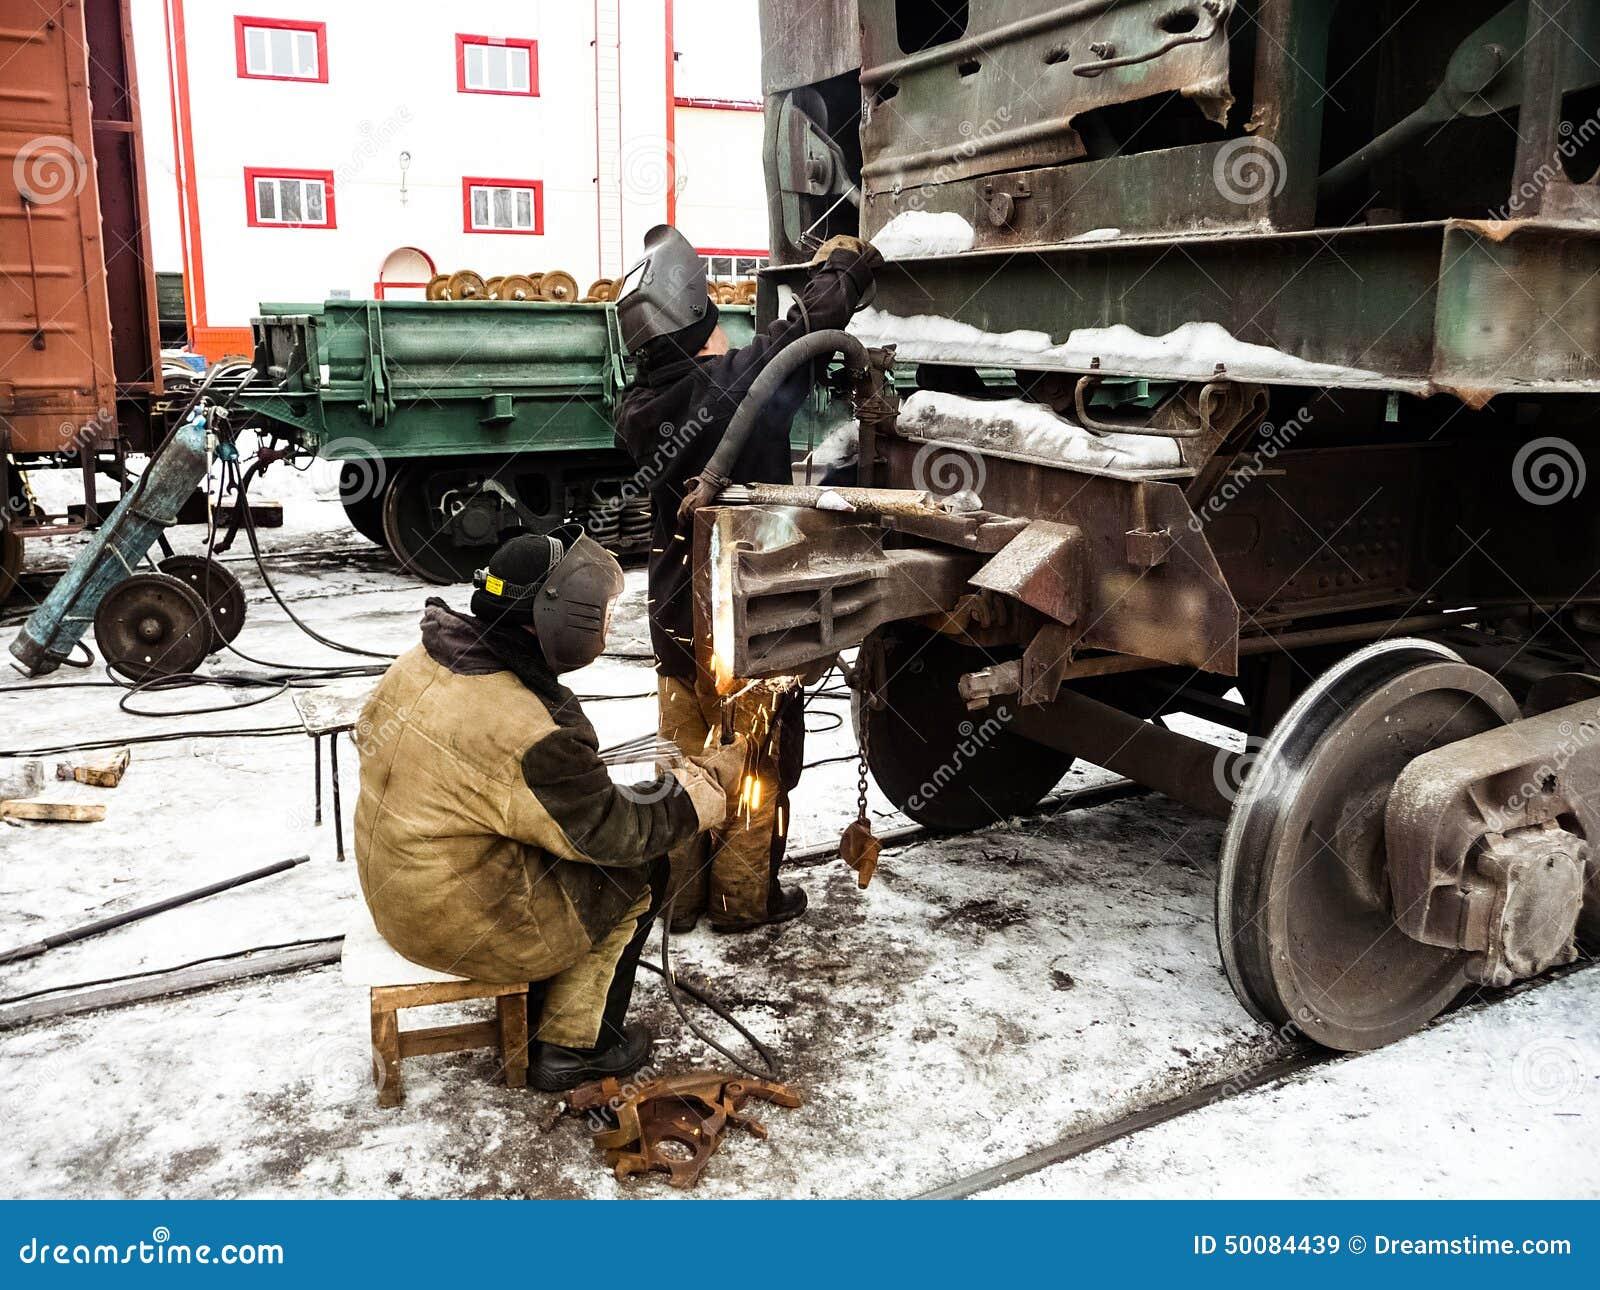 Welder Repairing Railway Carriage Stock Image - Image of